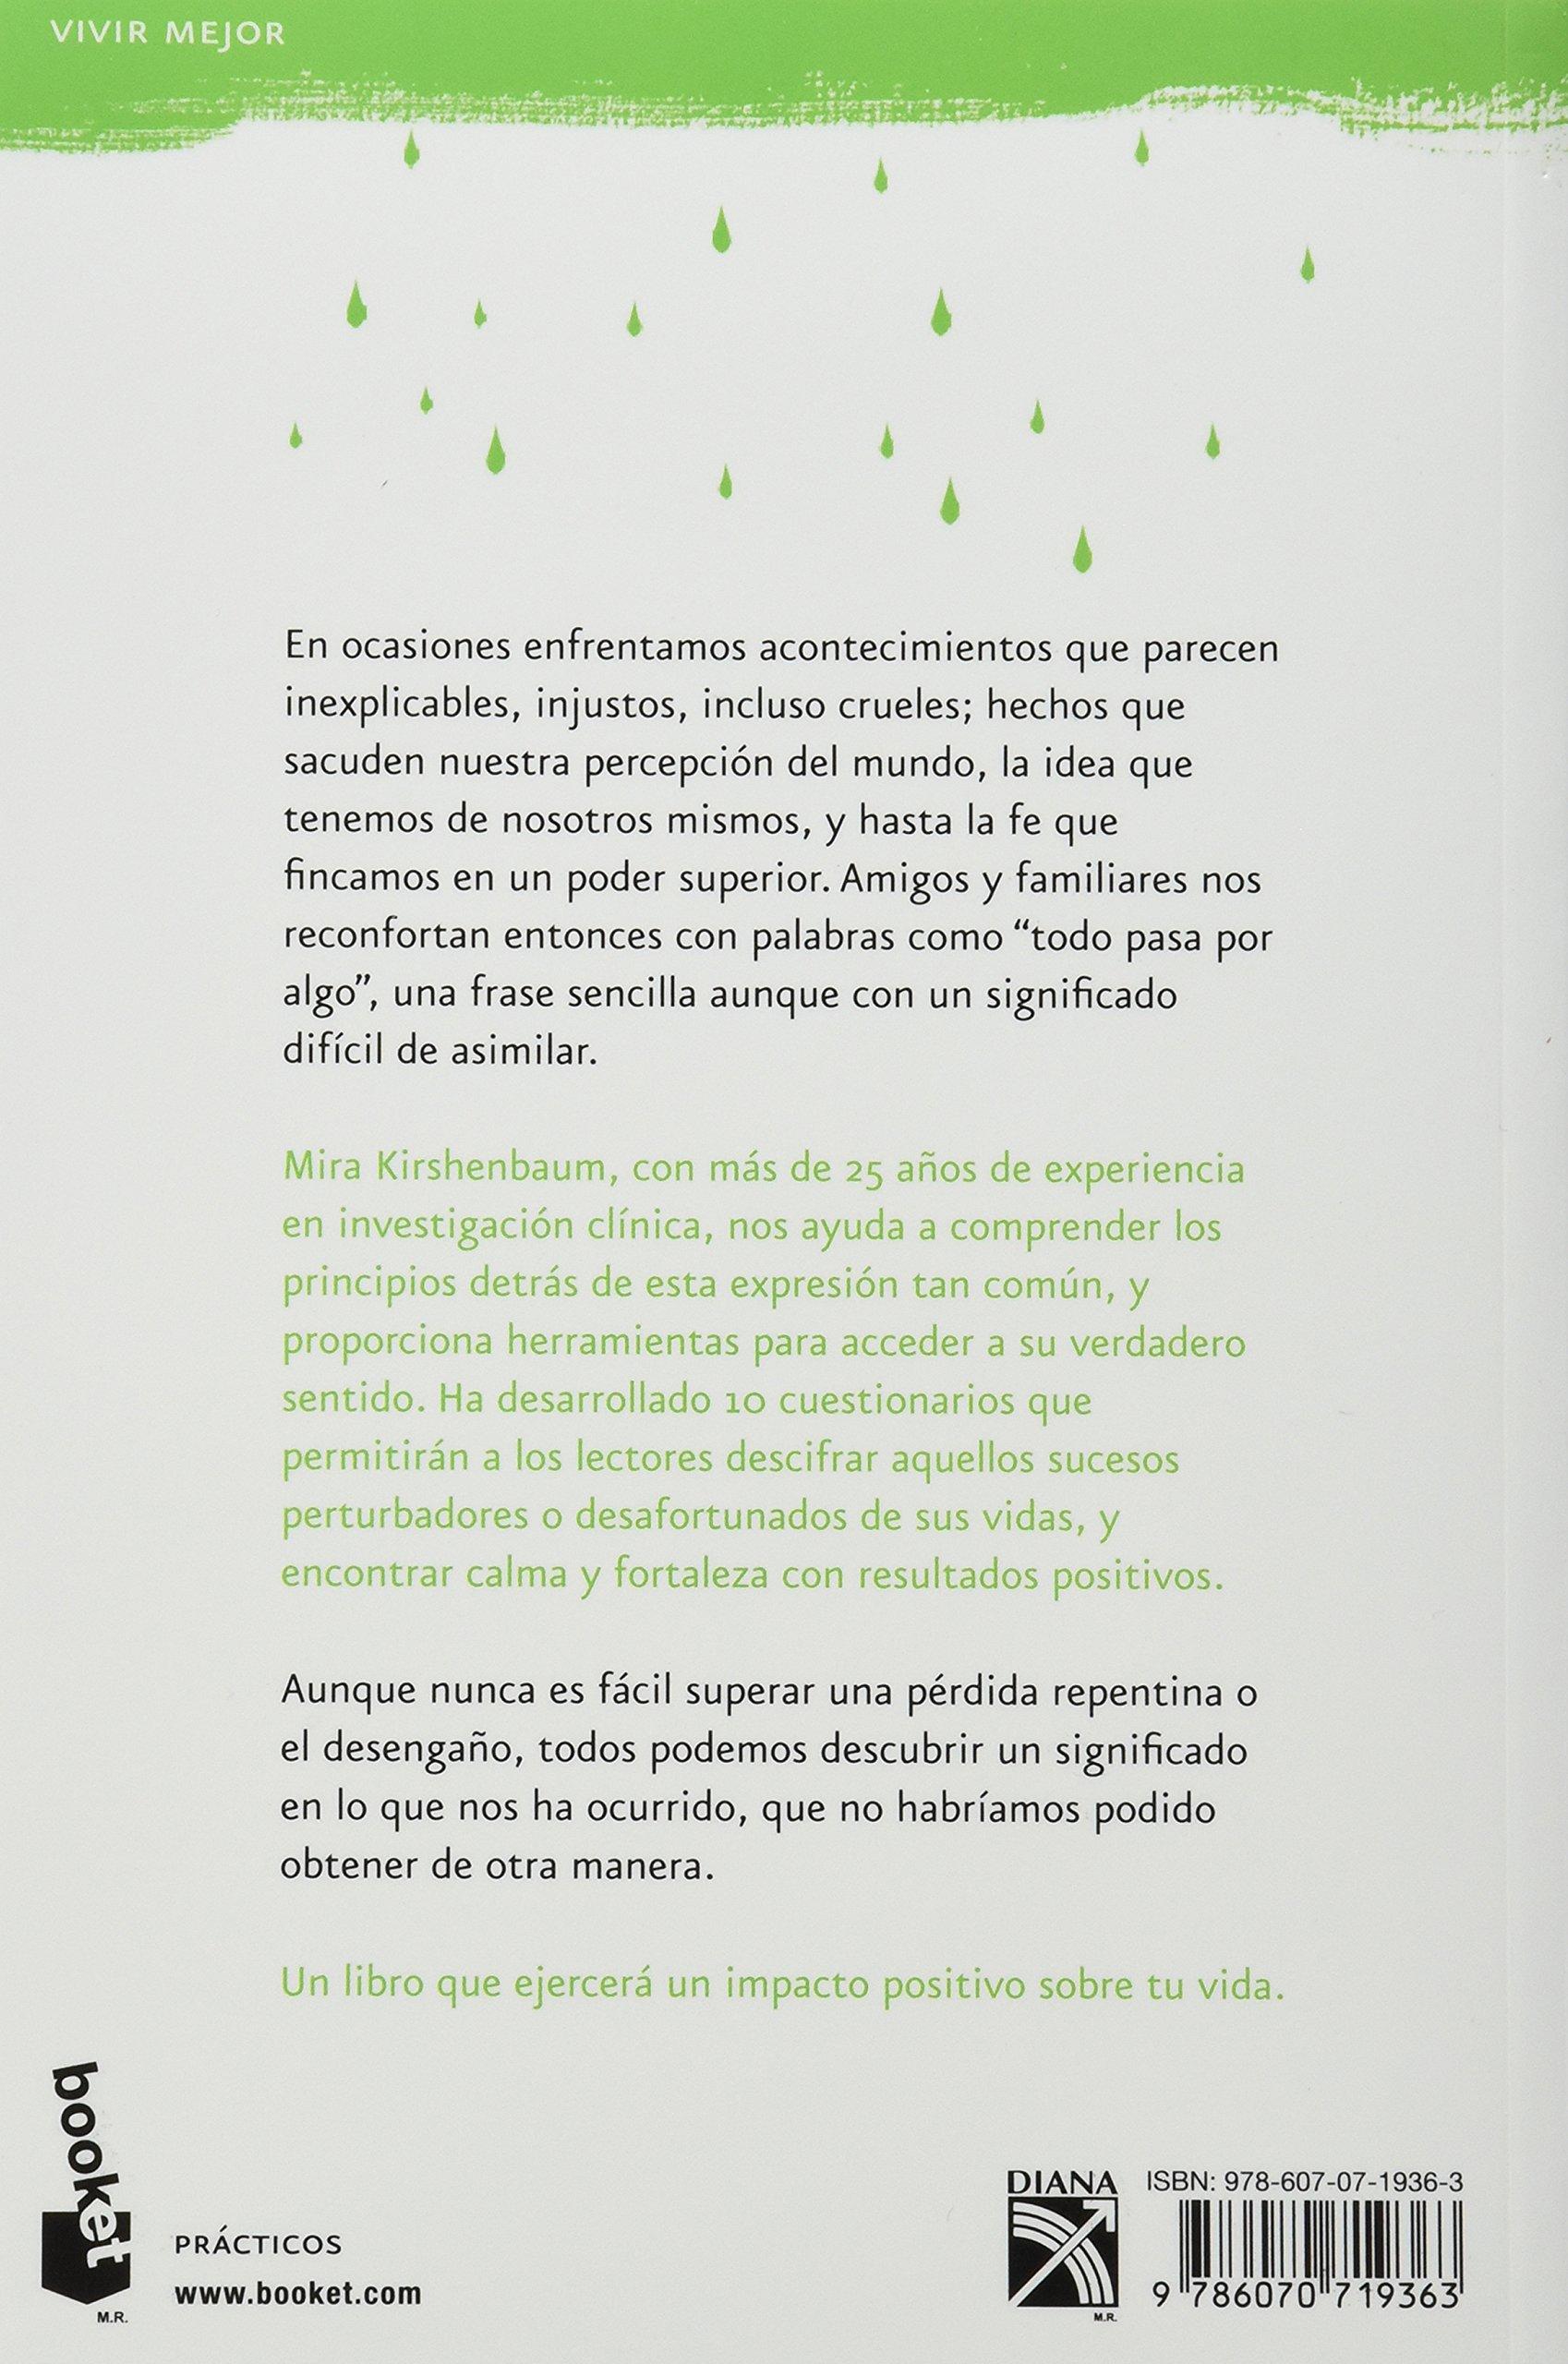 Todo Pasa Por Algo Spanish Edition Mira Kirshenbaum